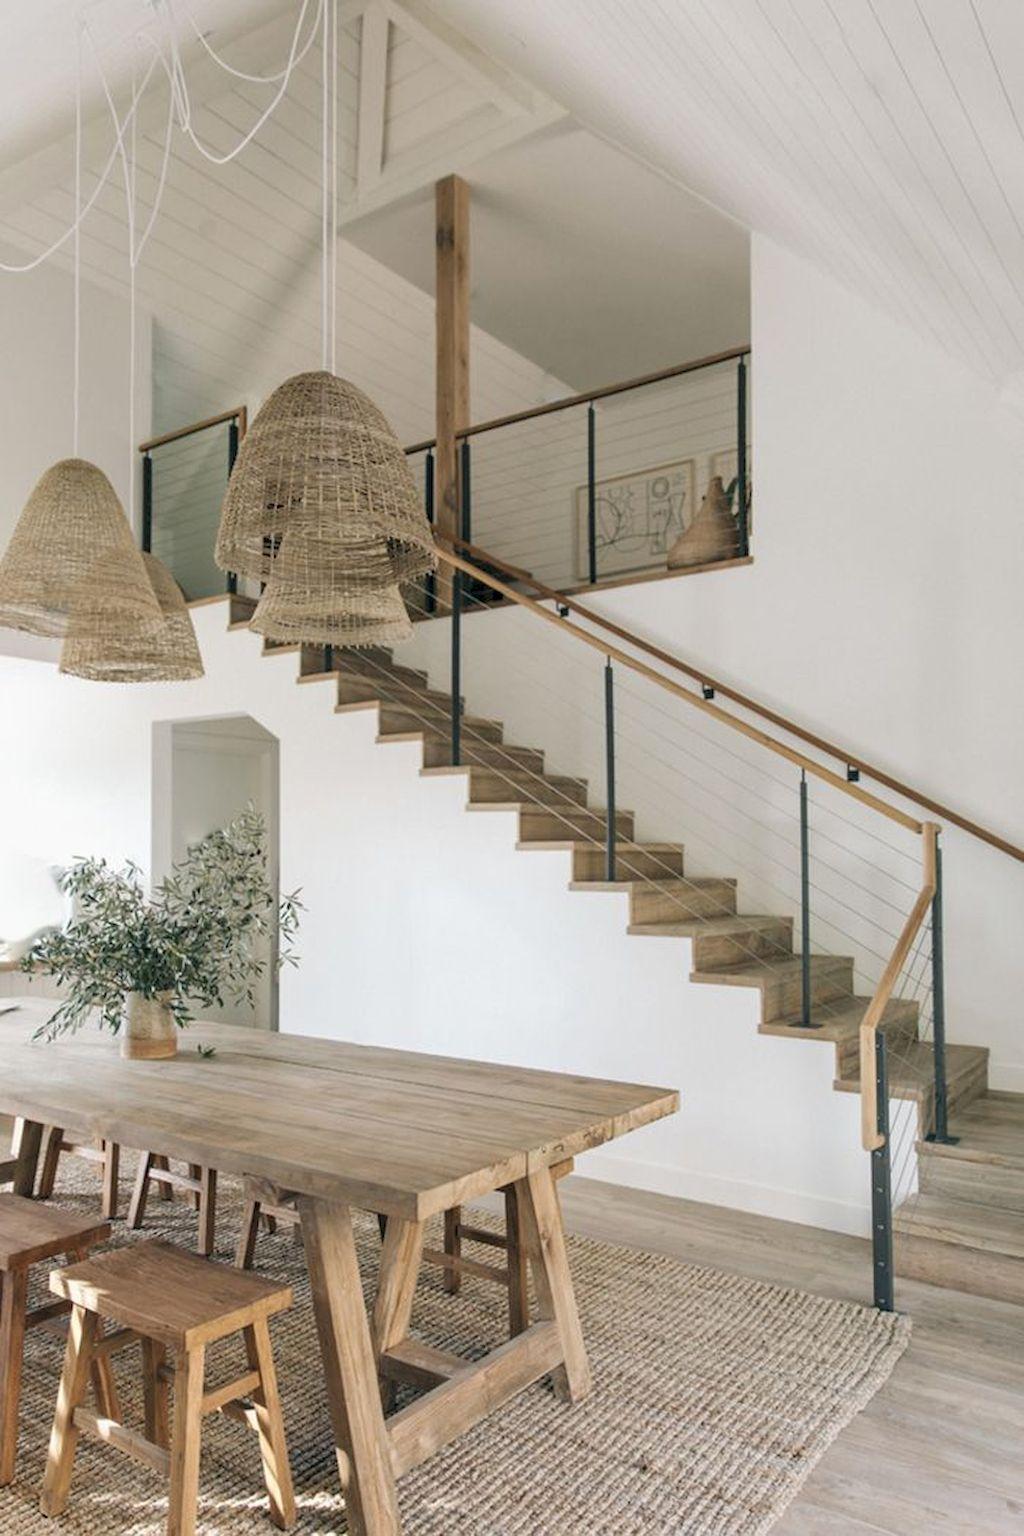 Wooden Furniture060